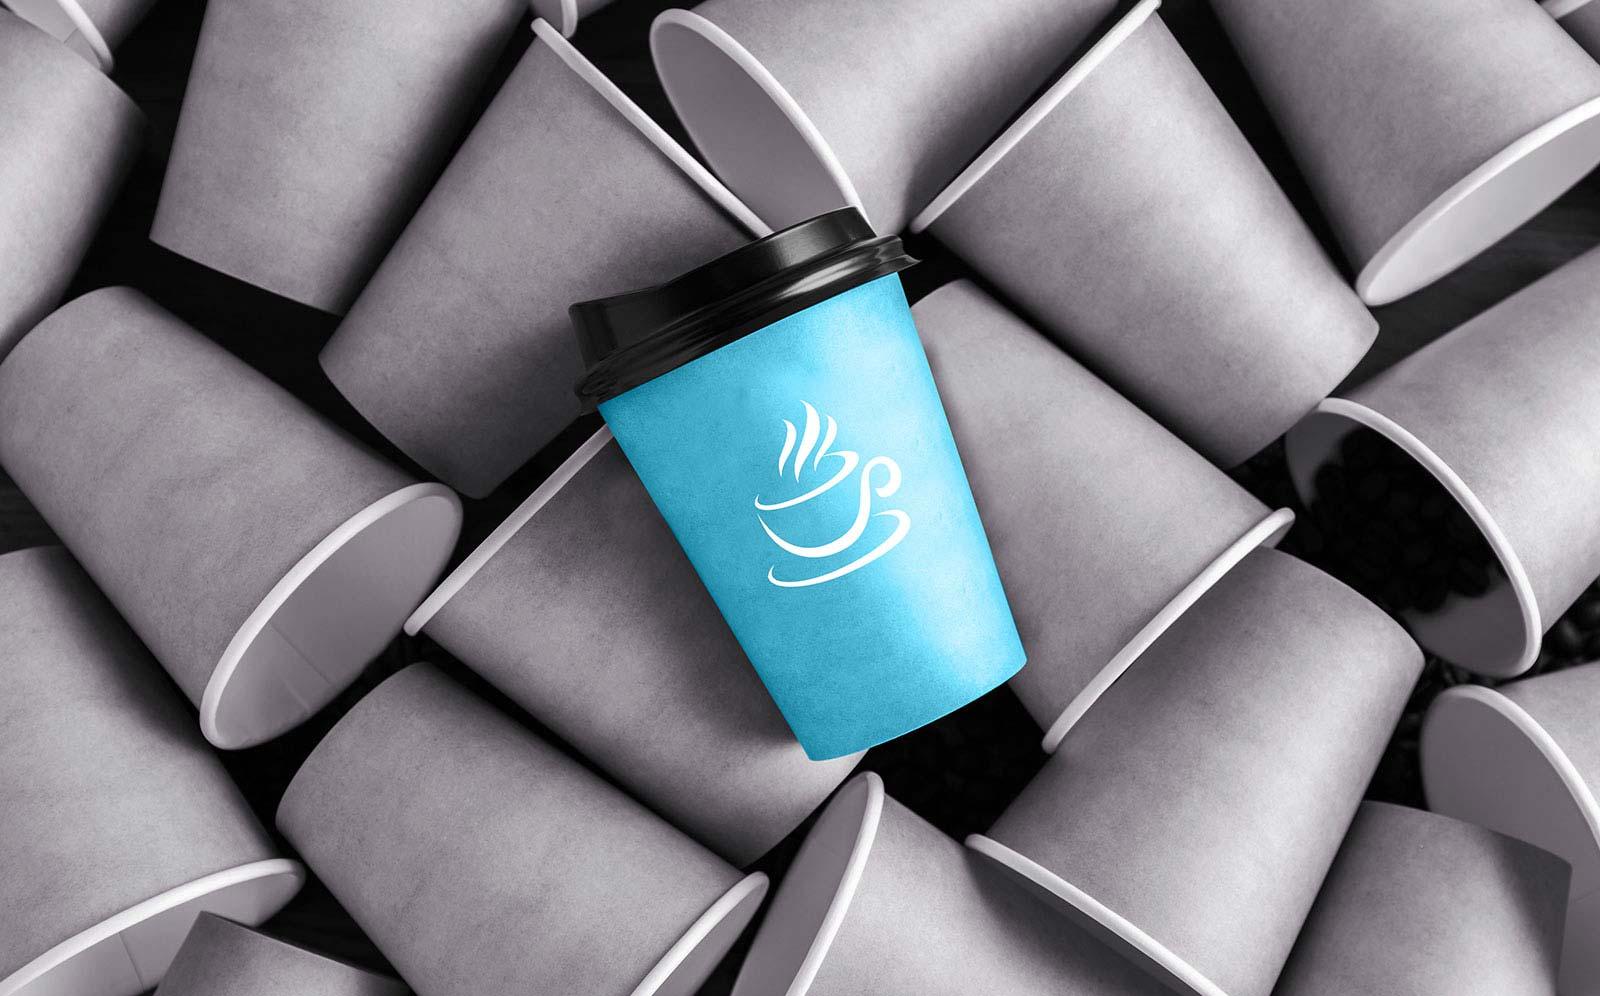 brand-design-web-design-digital-marketing-hiline-lahore-pakistan-home-overlay-Brand-Design